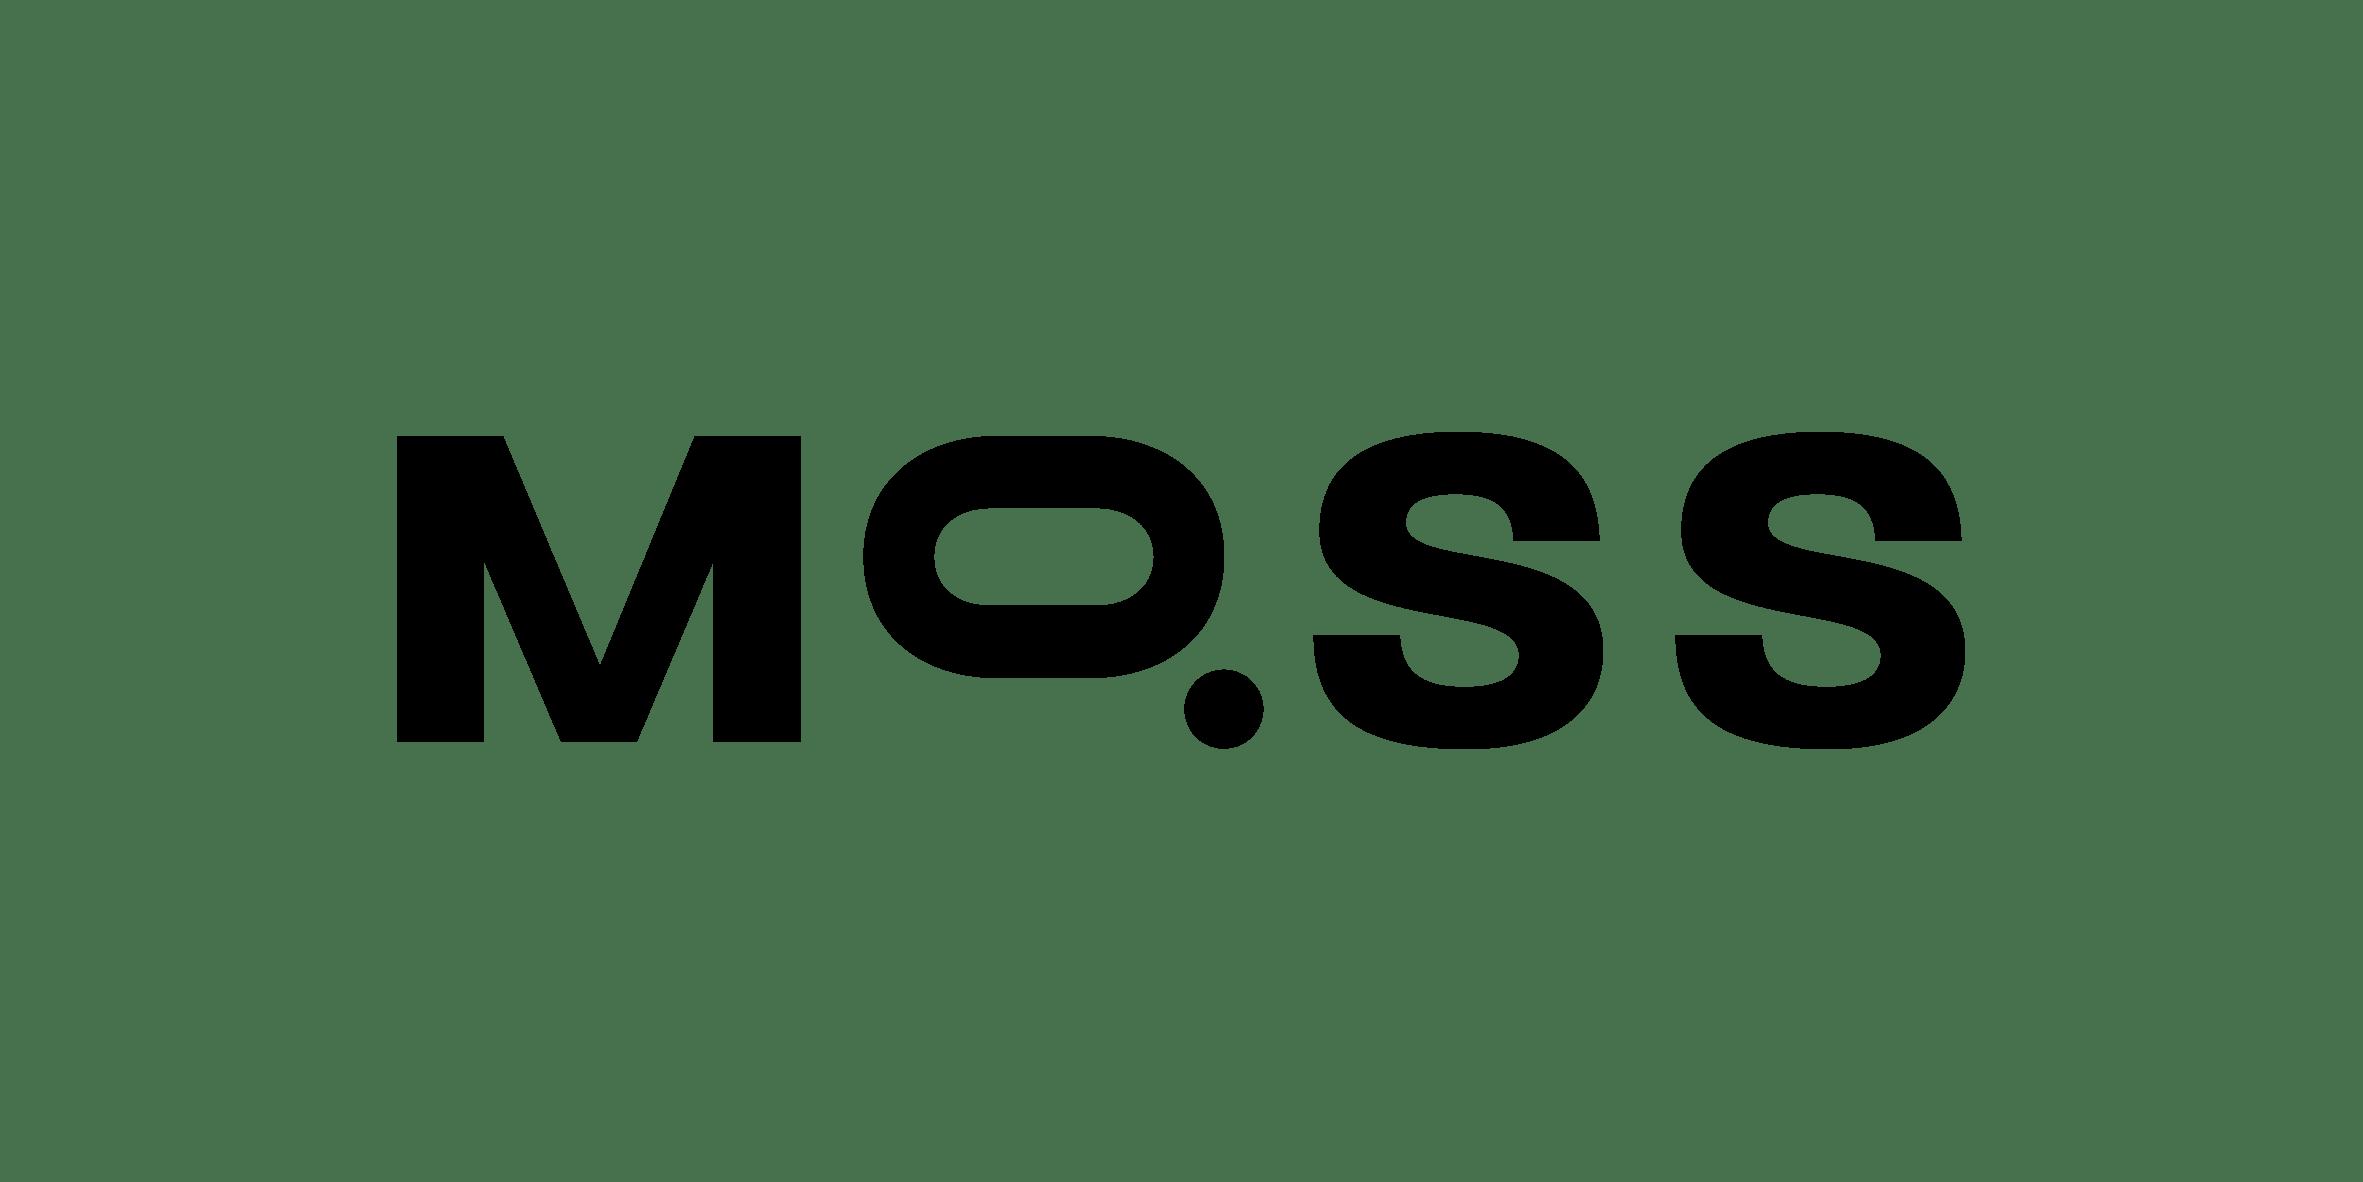 MOSS.Earth